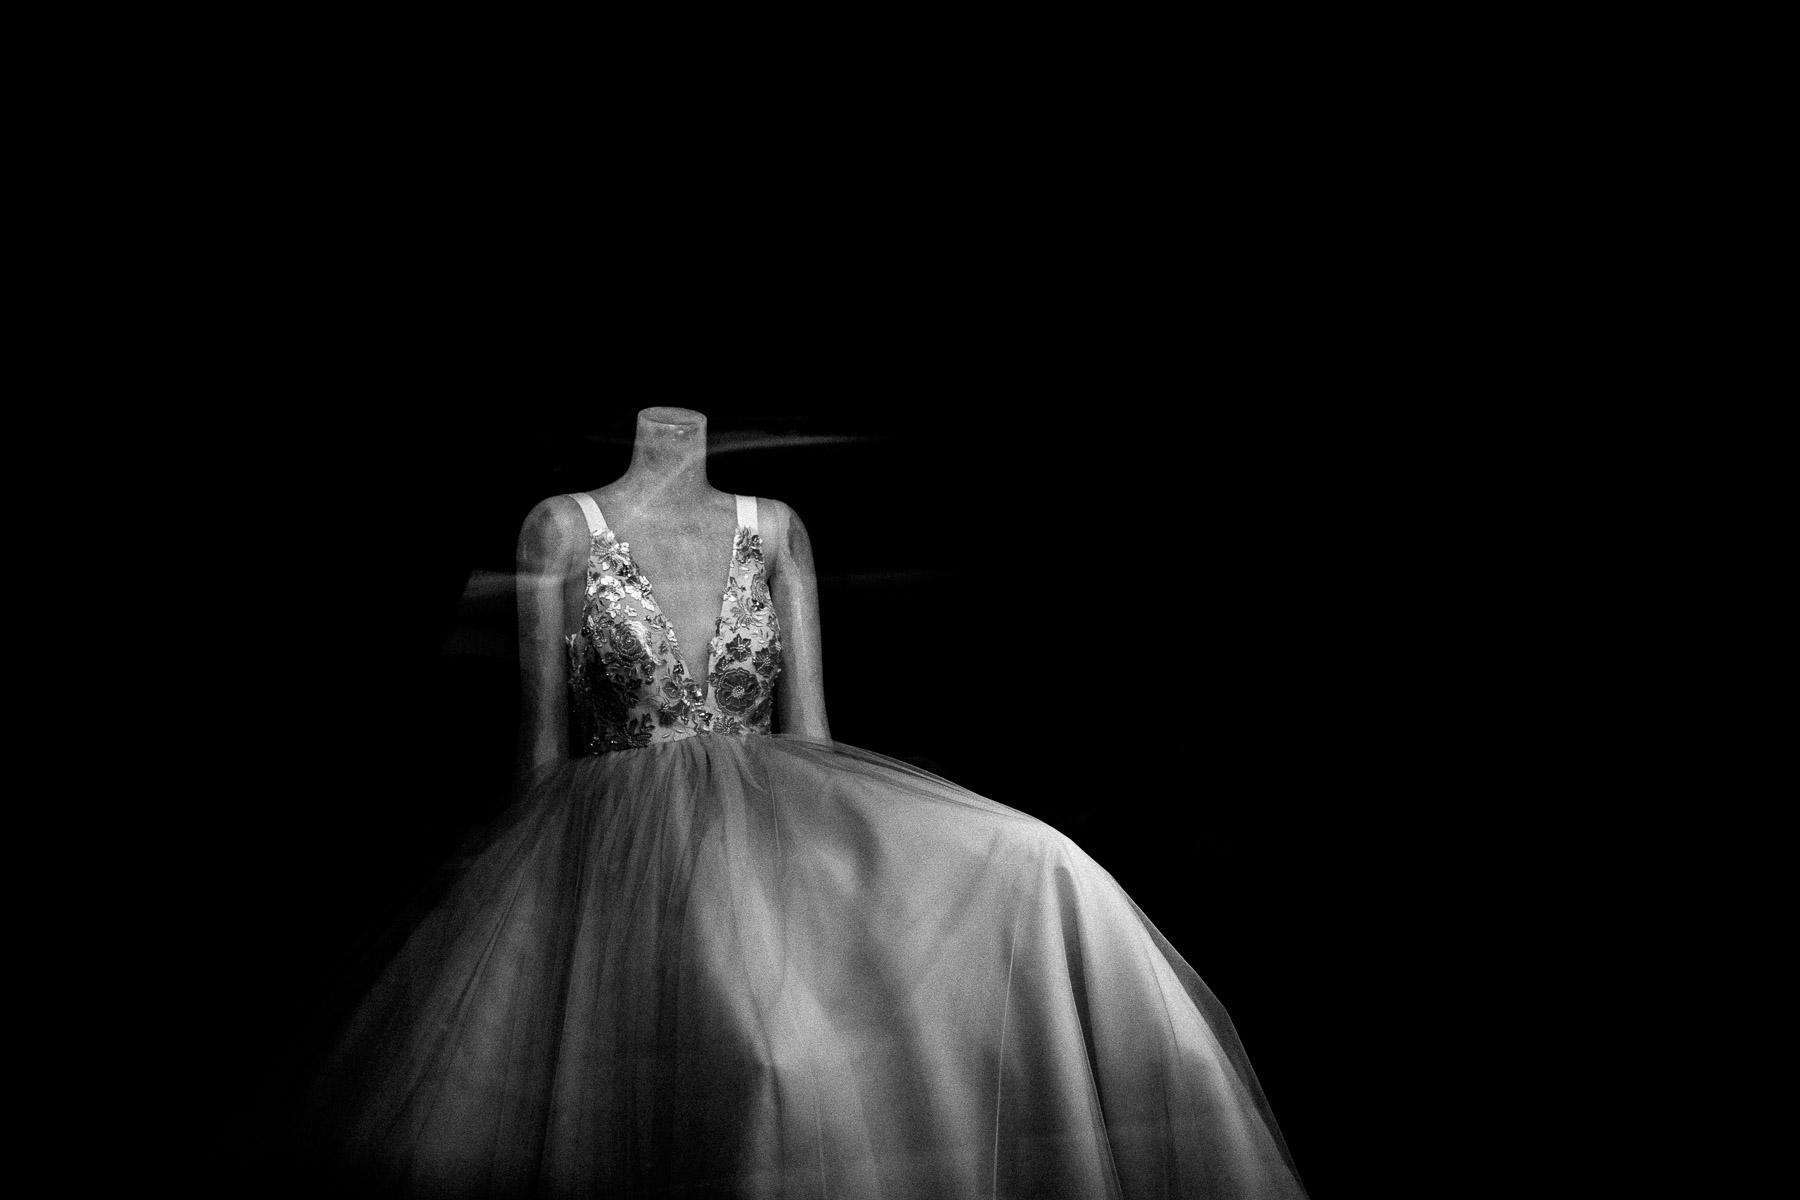 vera-wang-wedding-dress-fashion-week-ny-2015.jpg